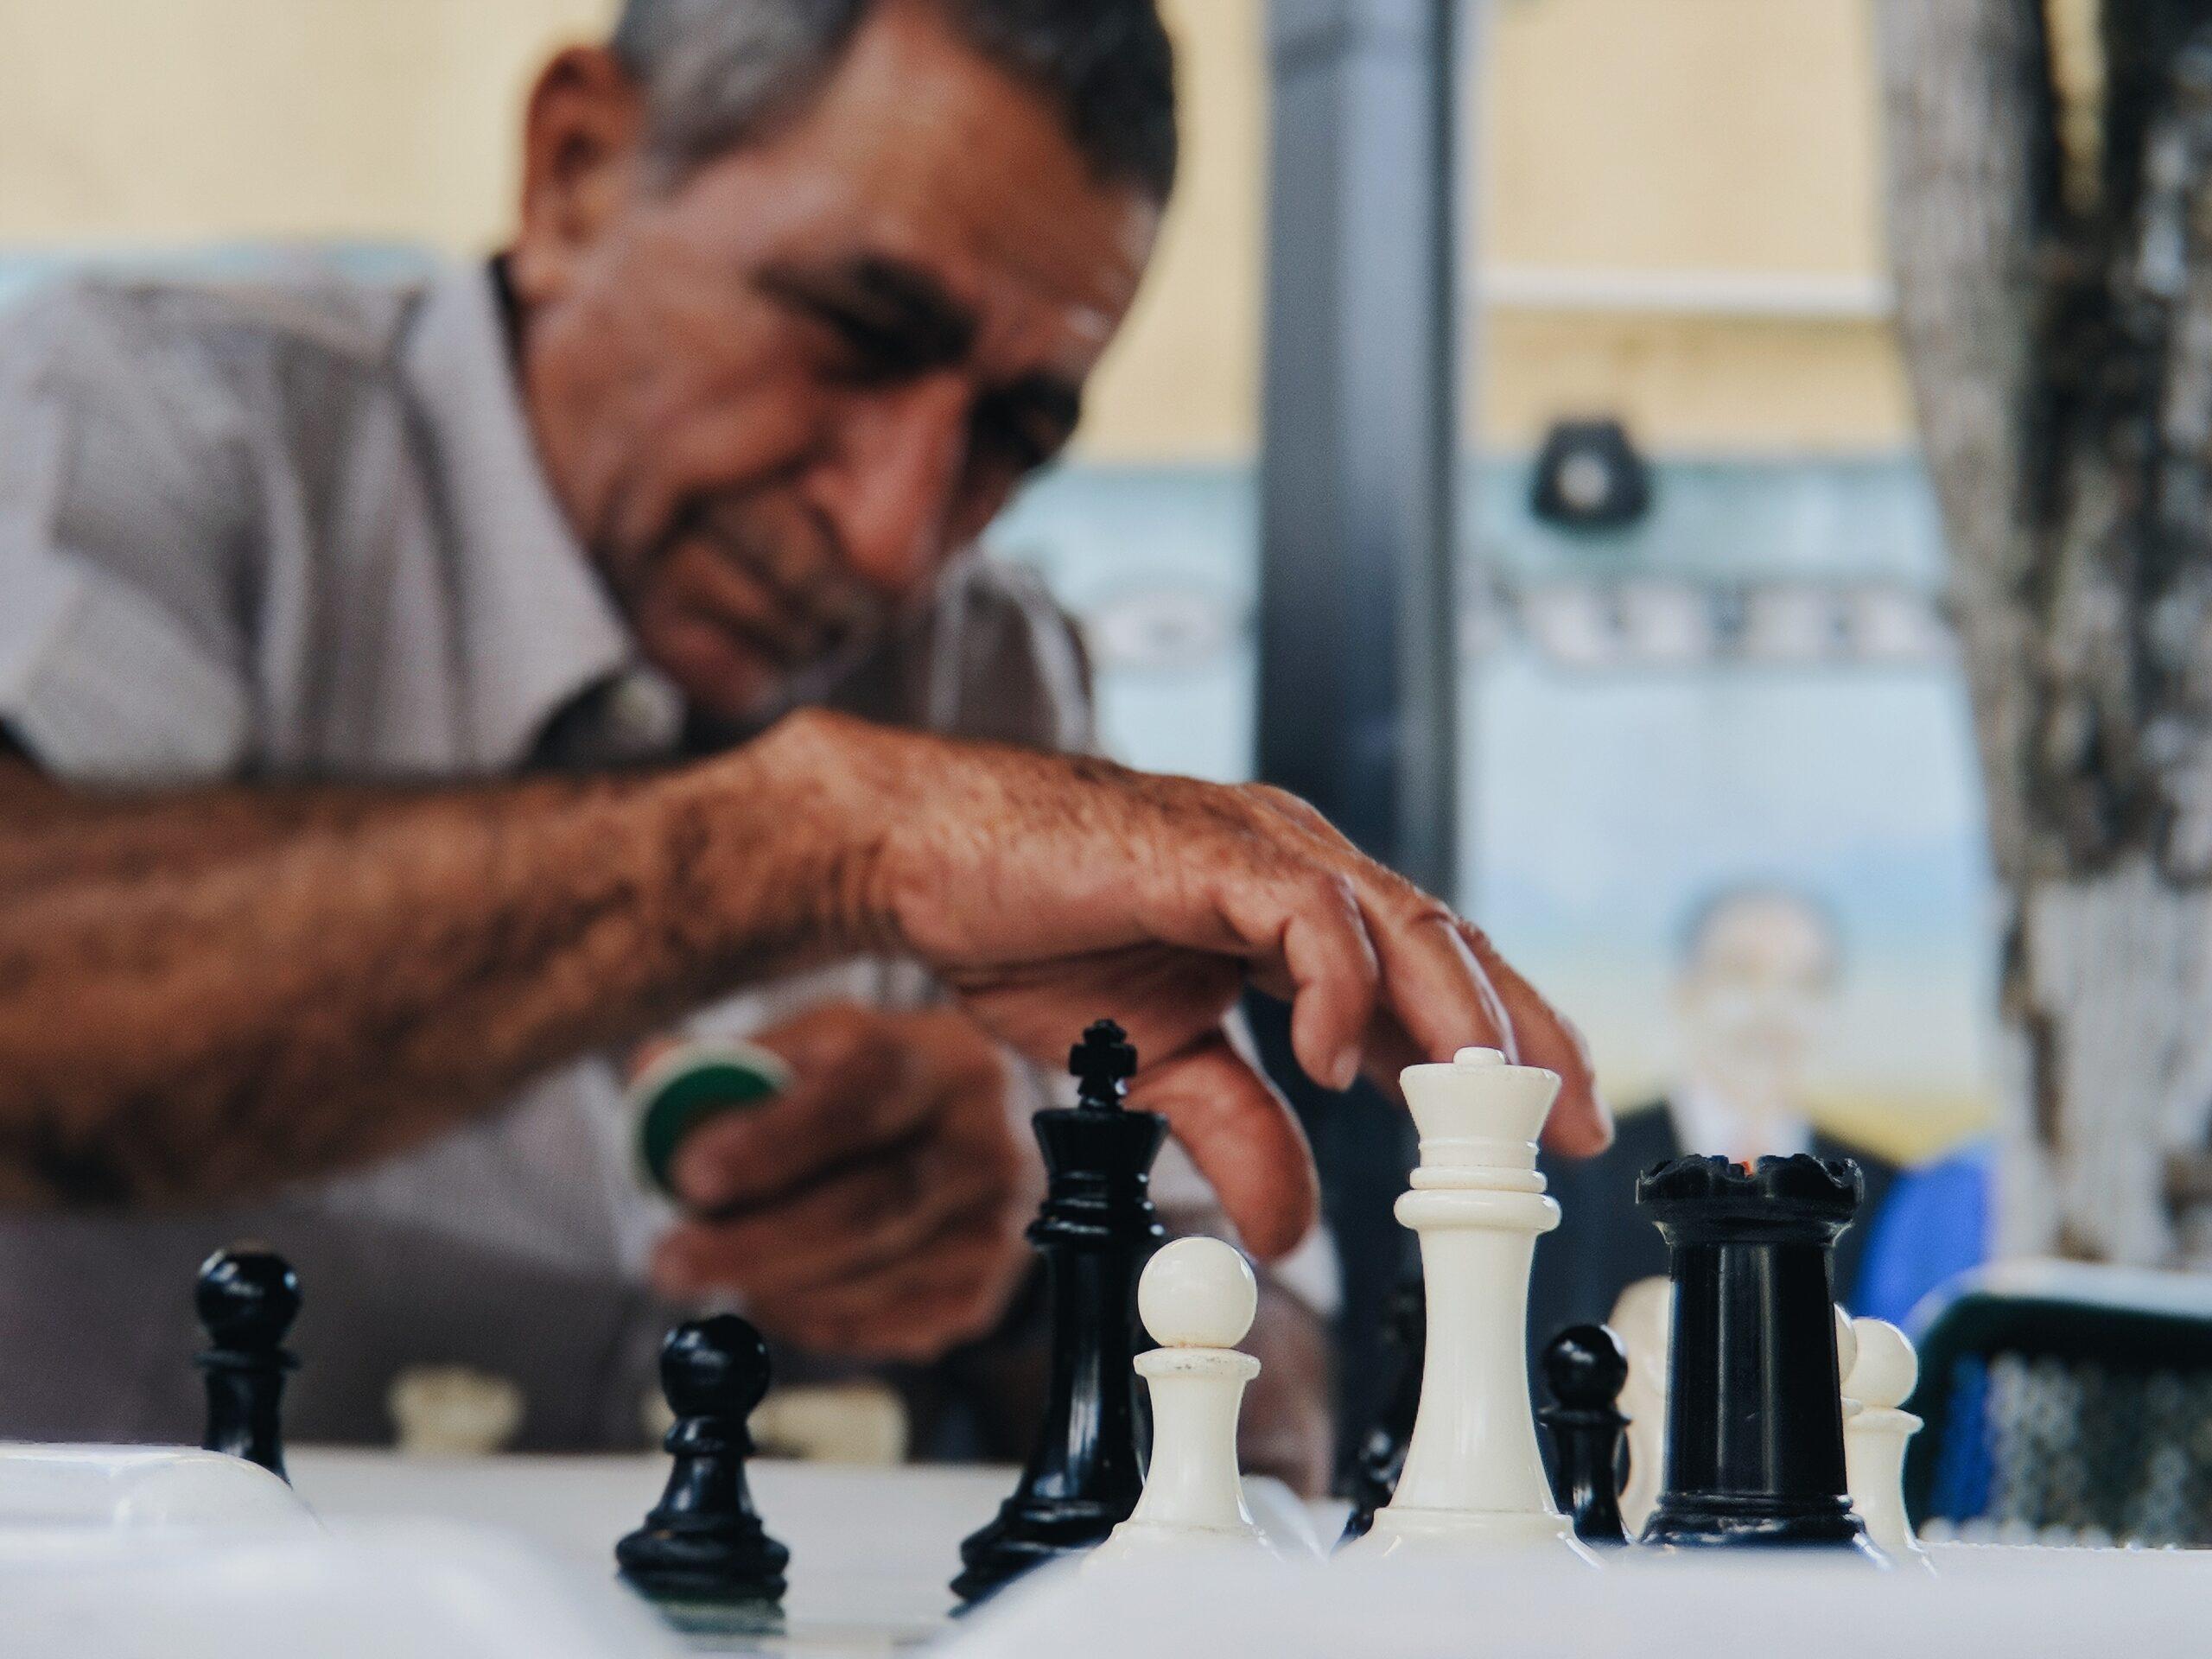 juno-jo-Man outdoor park chess board moving piece-unsplash (1